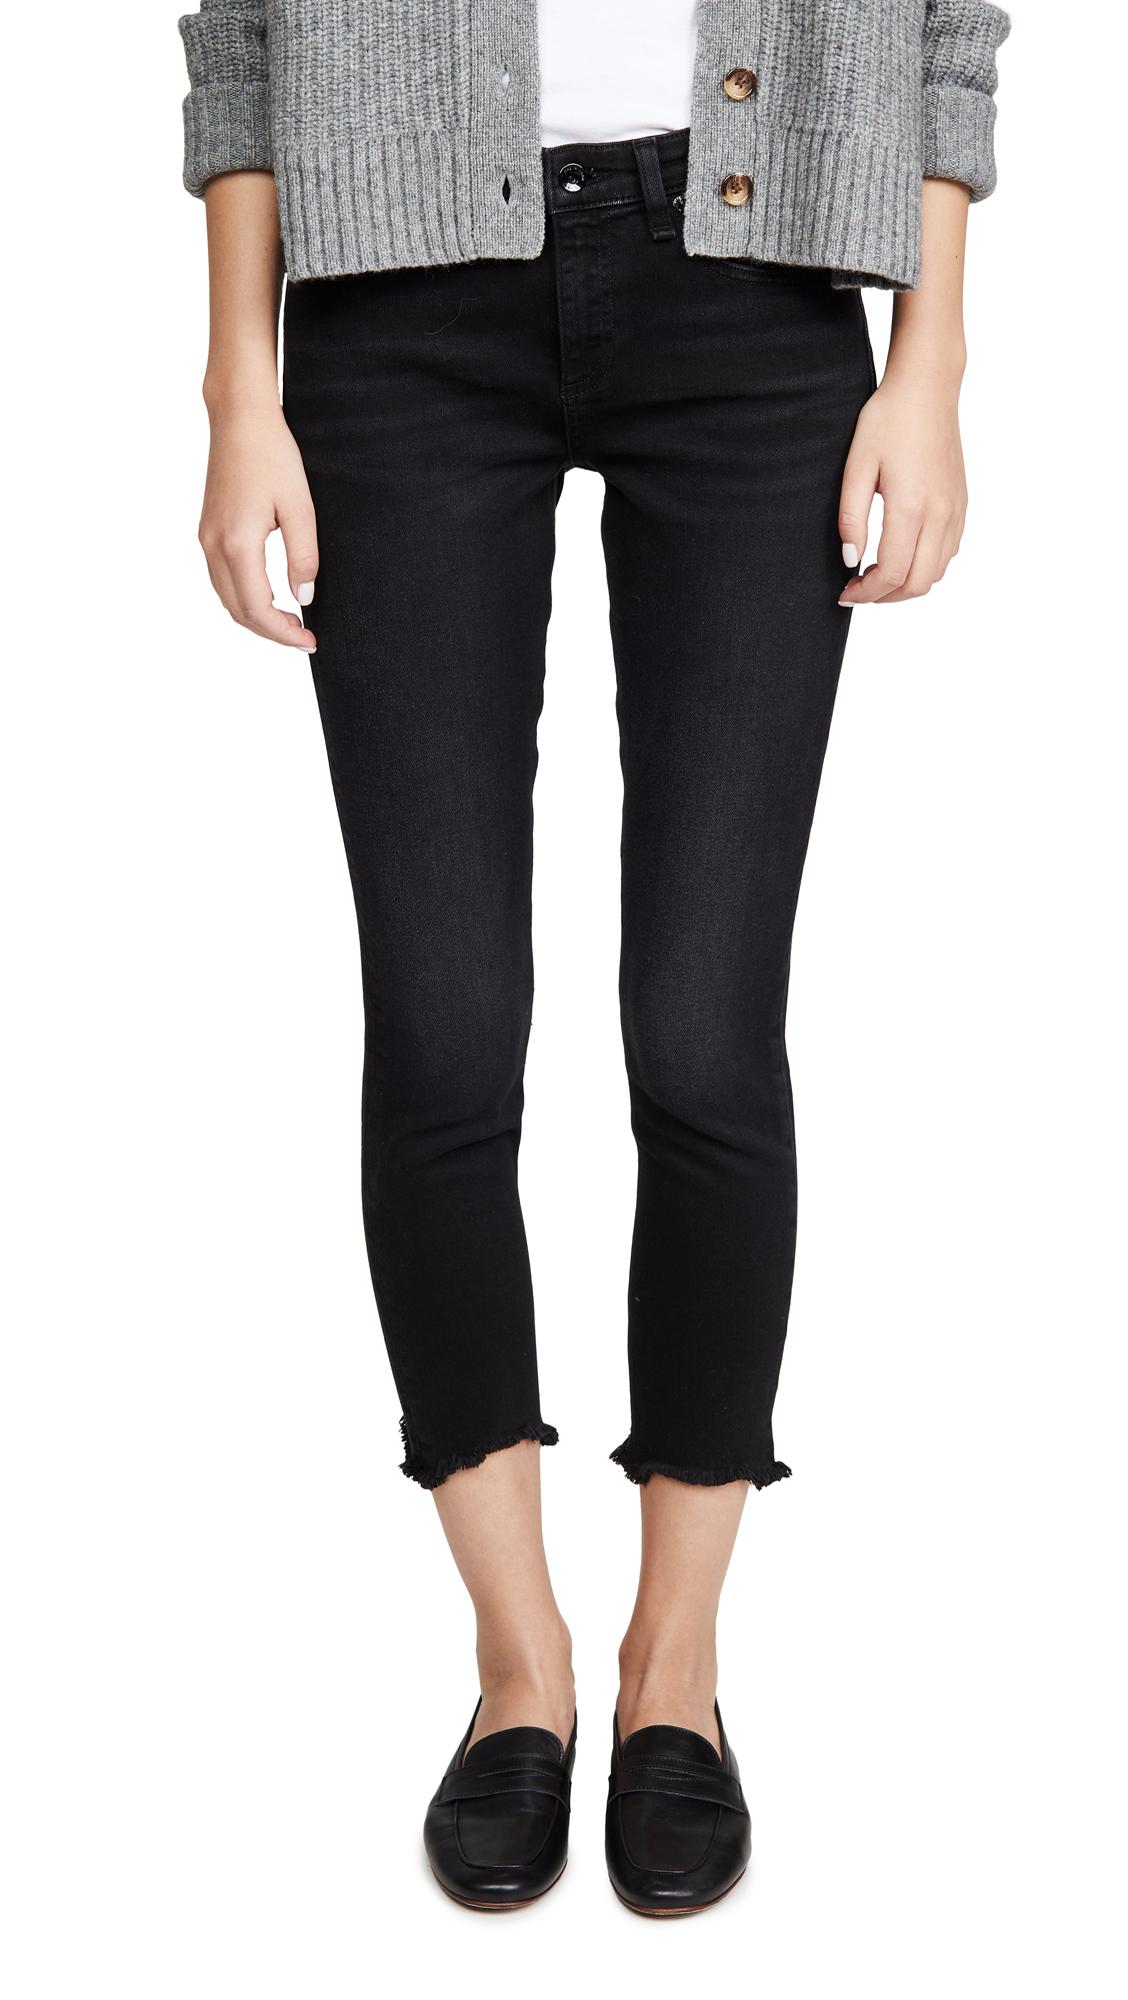 Buy Rag & Bone/JEAN online - photo of Rag & Bone/JEAN Cate Mid-Rise Ankle Skinny Jeans